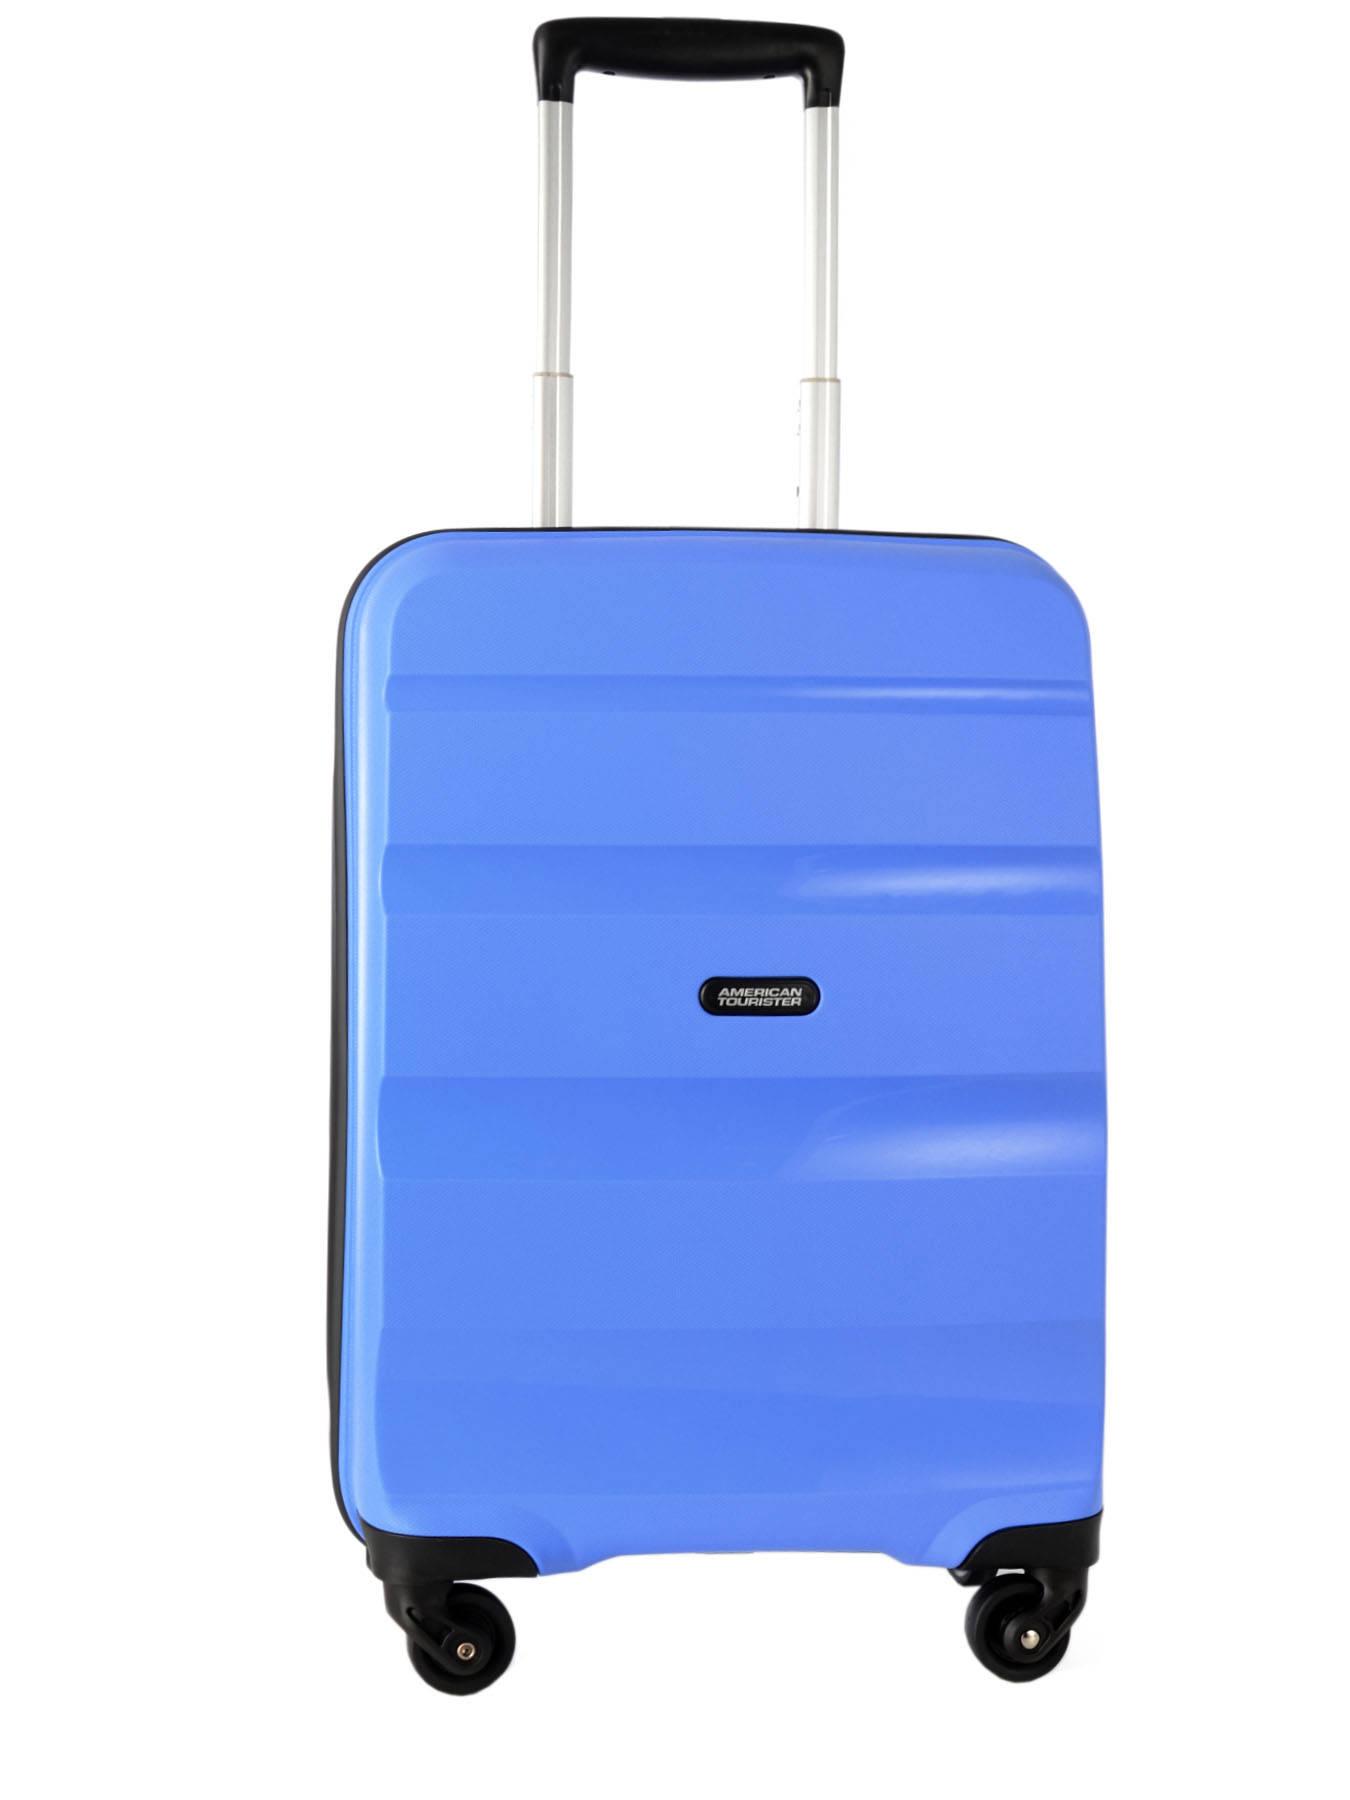 promo valise cabine american tourister bon air. Black Bedroom Furniture Sets. Home Design Ideas